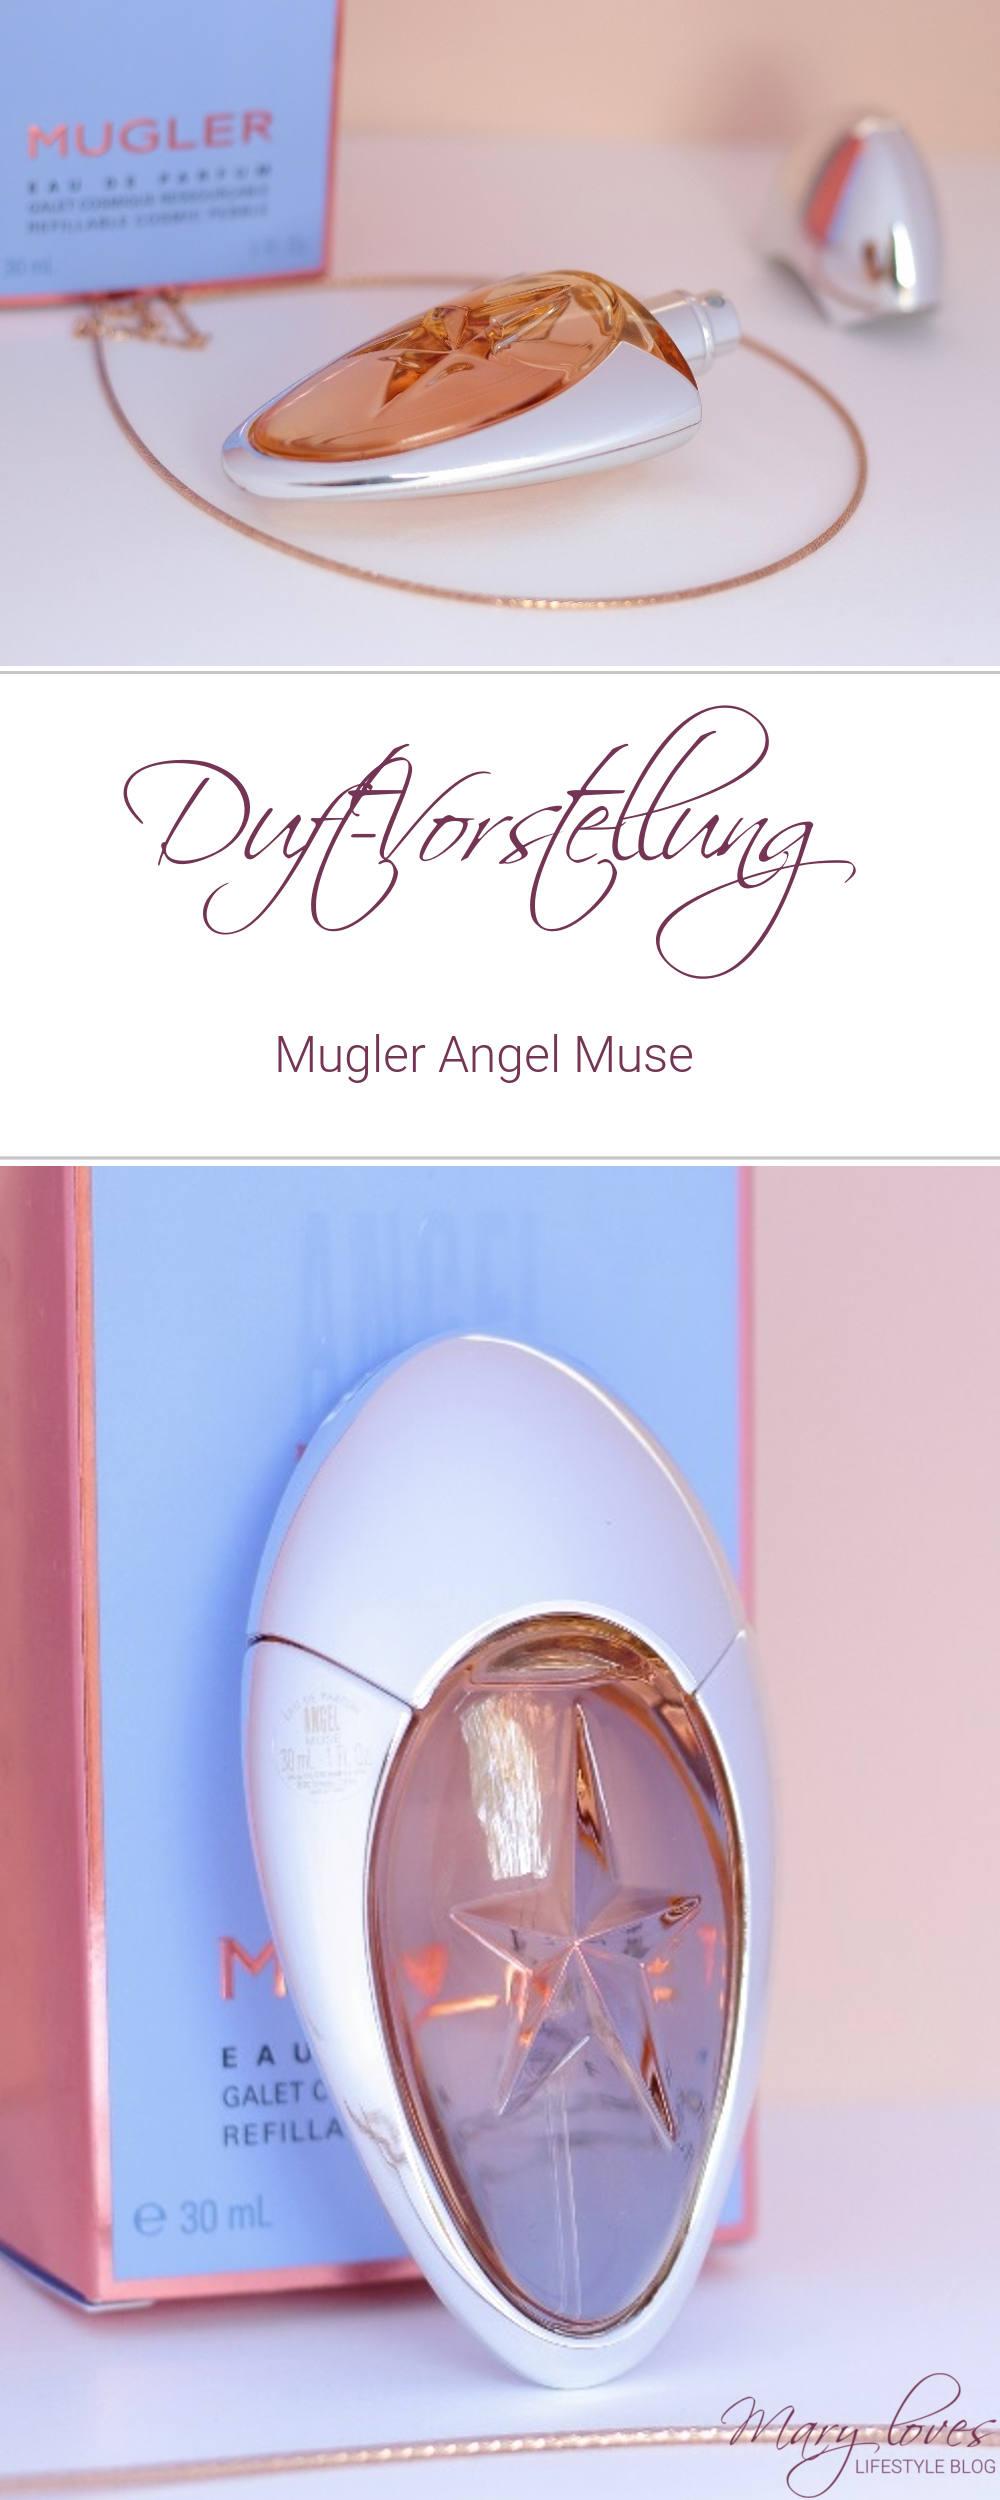 [Duftvorstellung] Mugler Angel Muse